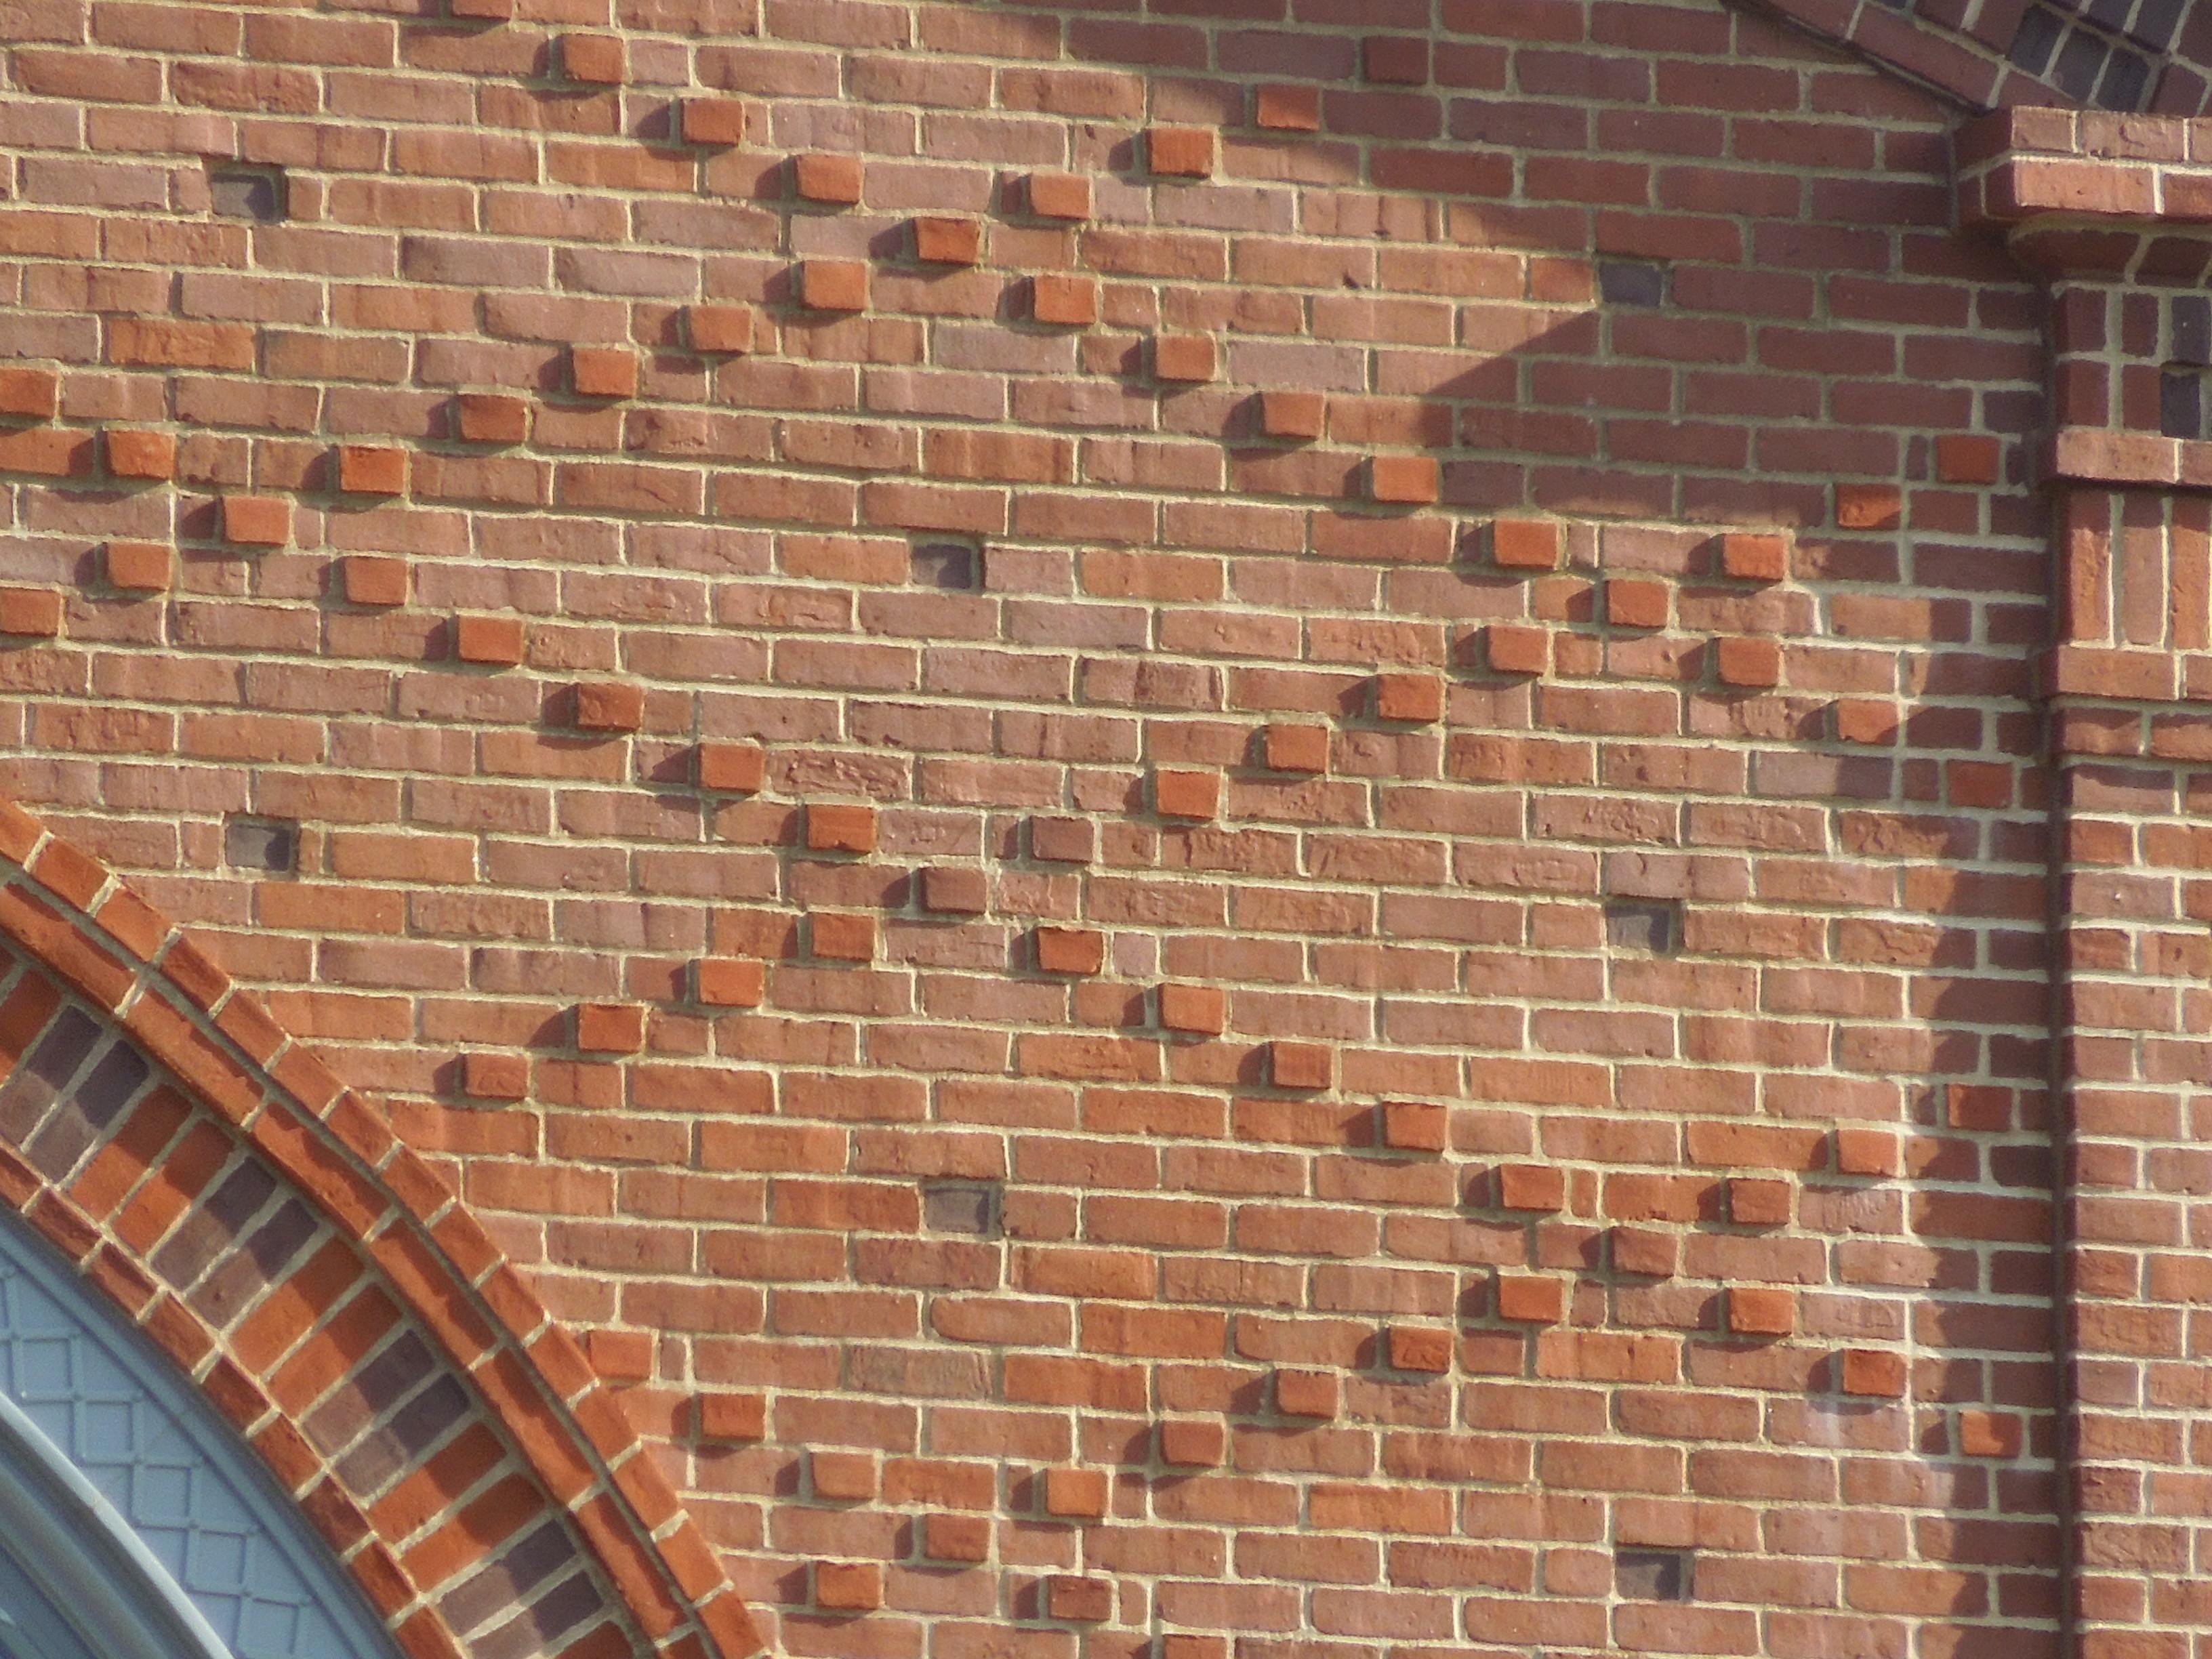 Brick Patterns & Diapering